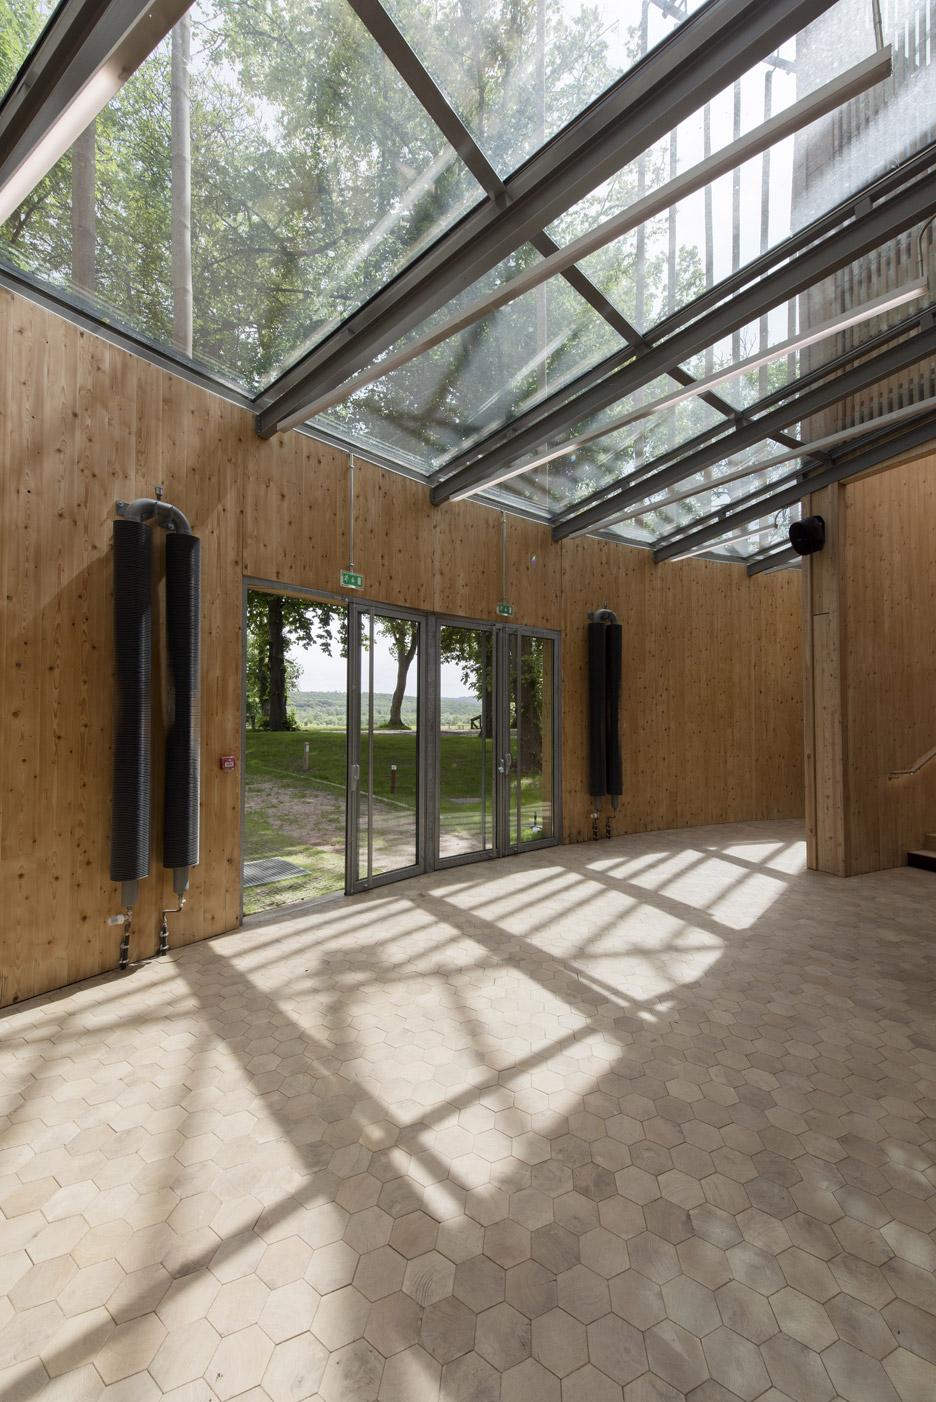 andrew-todd-theatre-pas-de-calais-globe-elizabethan-france-cross-laminated-timber_dezeen_936_1